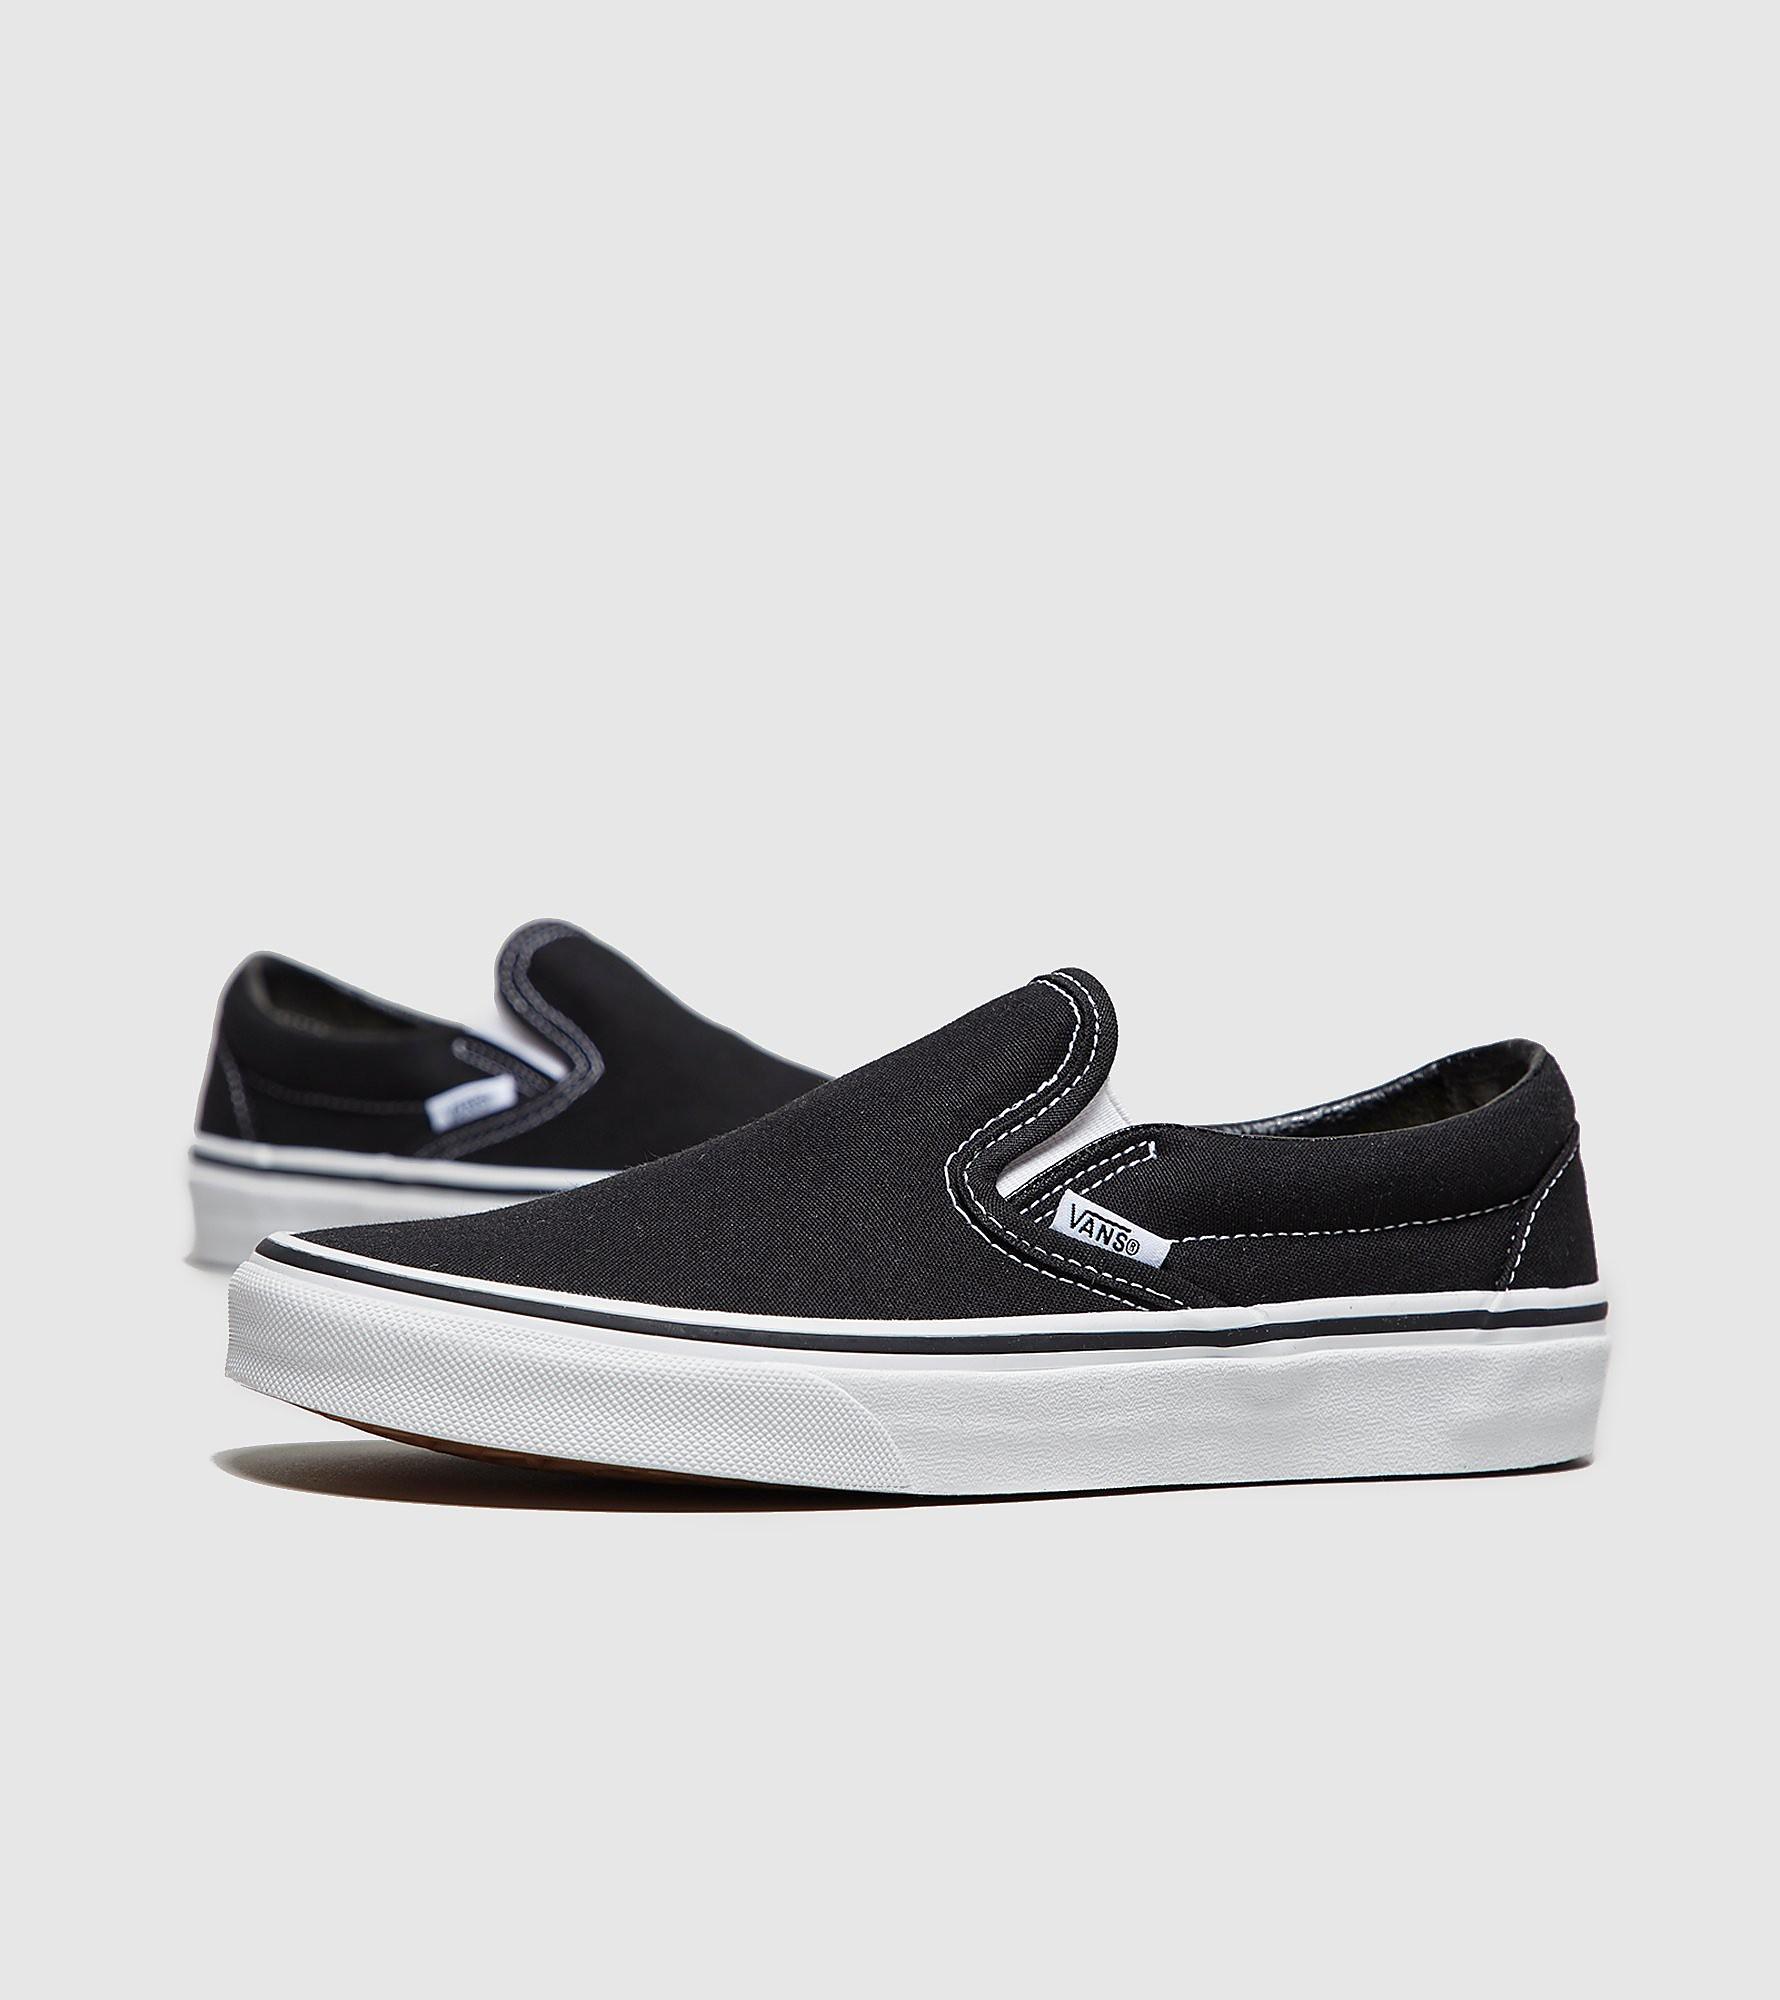 Vans Classic Slip-On Women's